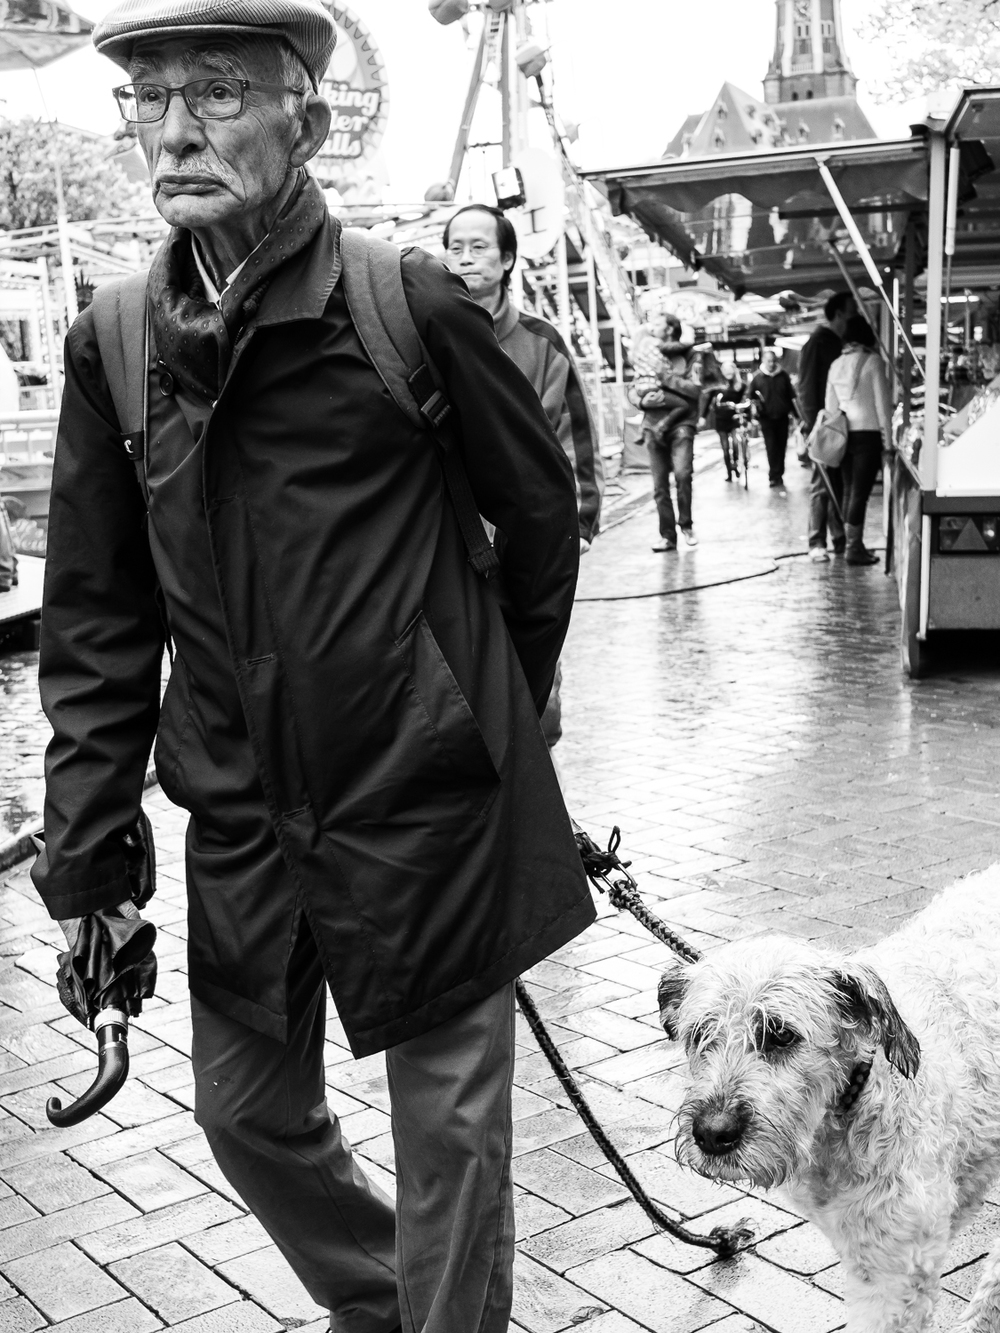 fokko muller street photography - 130511 - 003.jpg